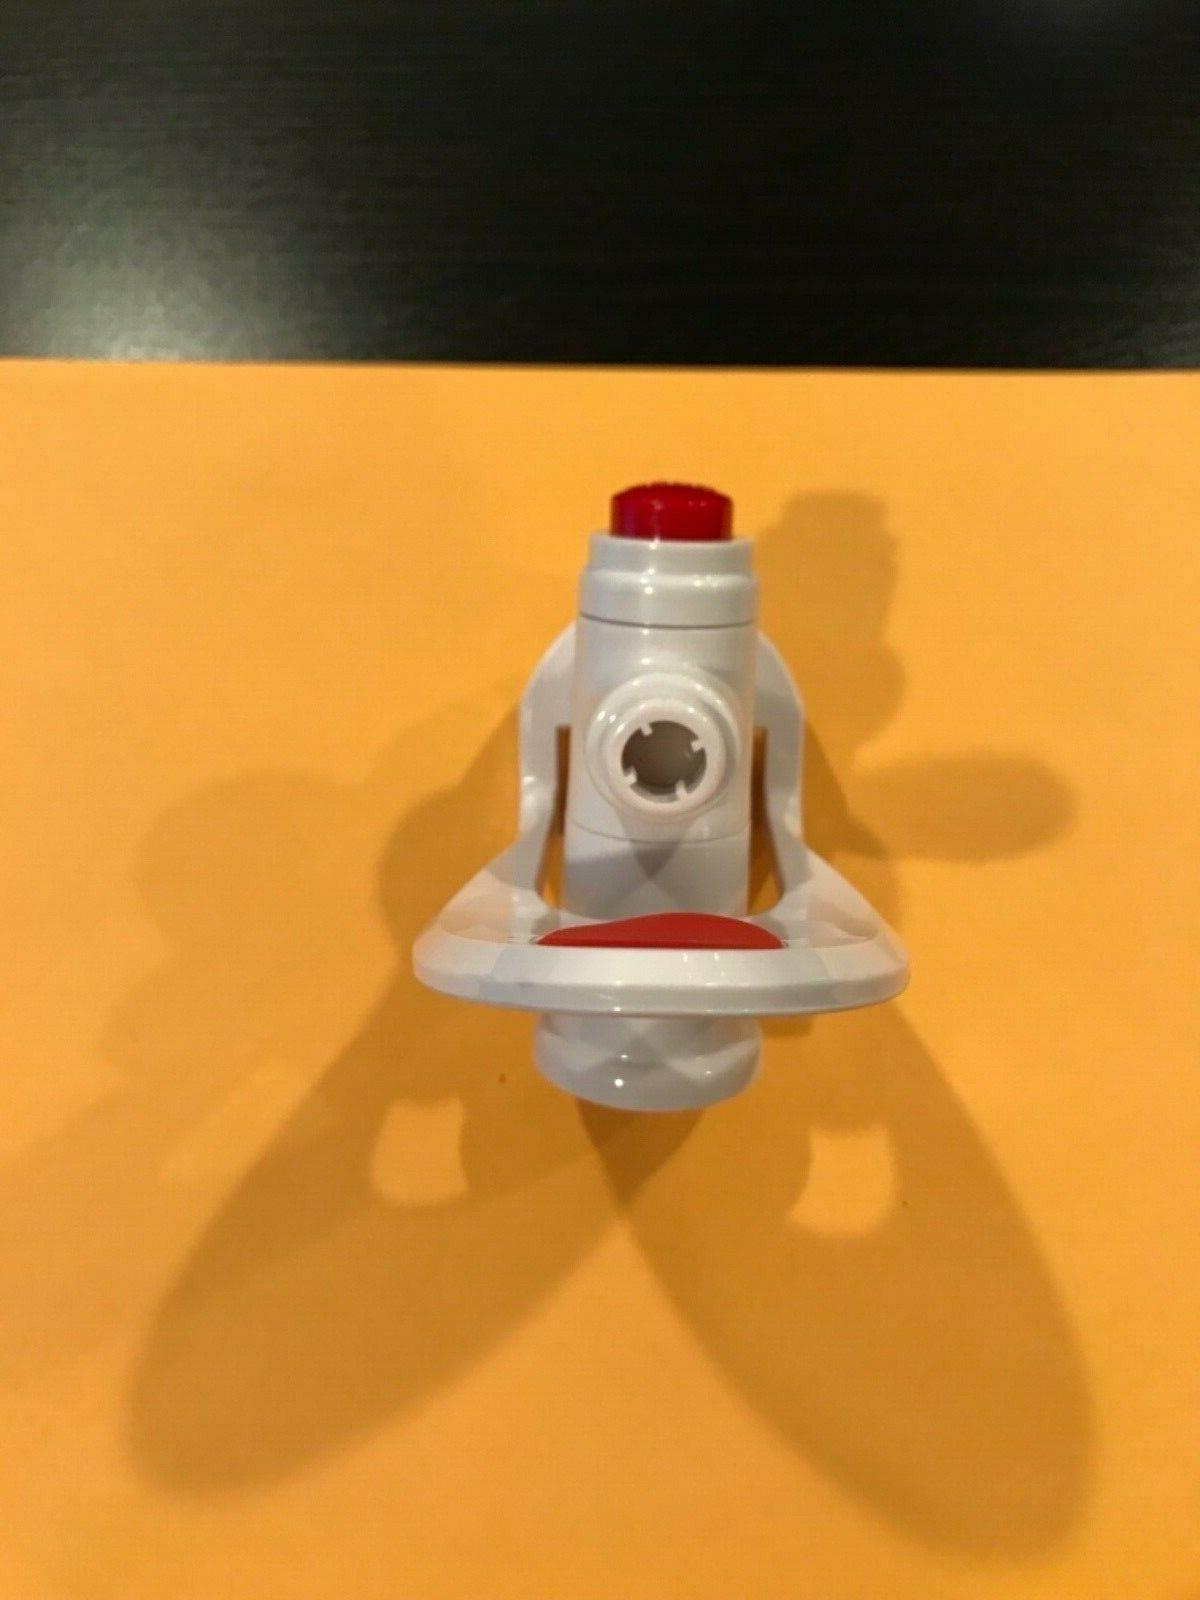 New! Honeywell cooler hot valve, dispenser